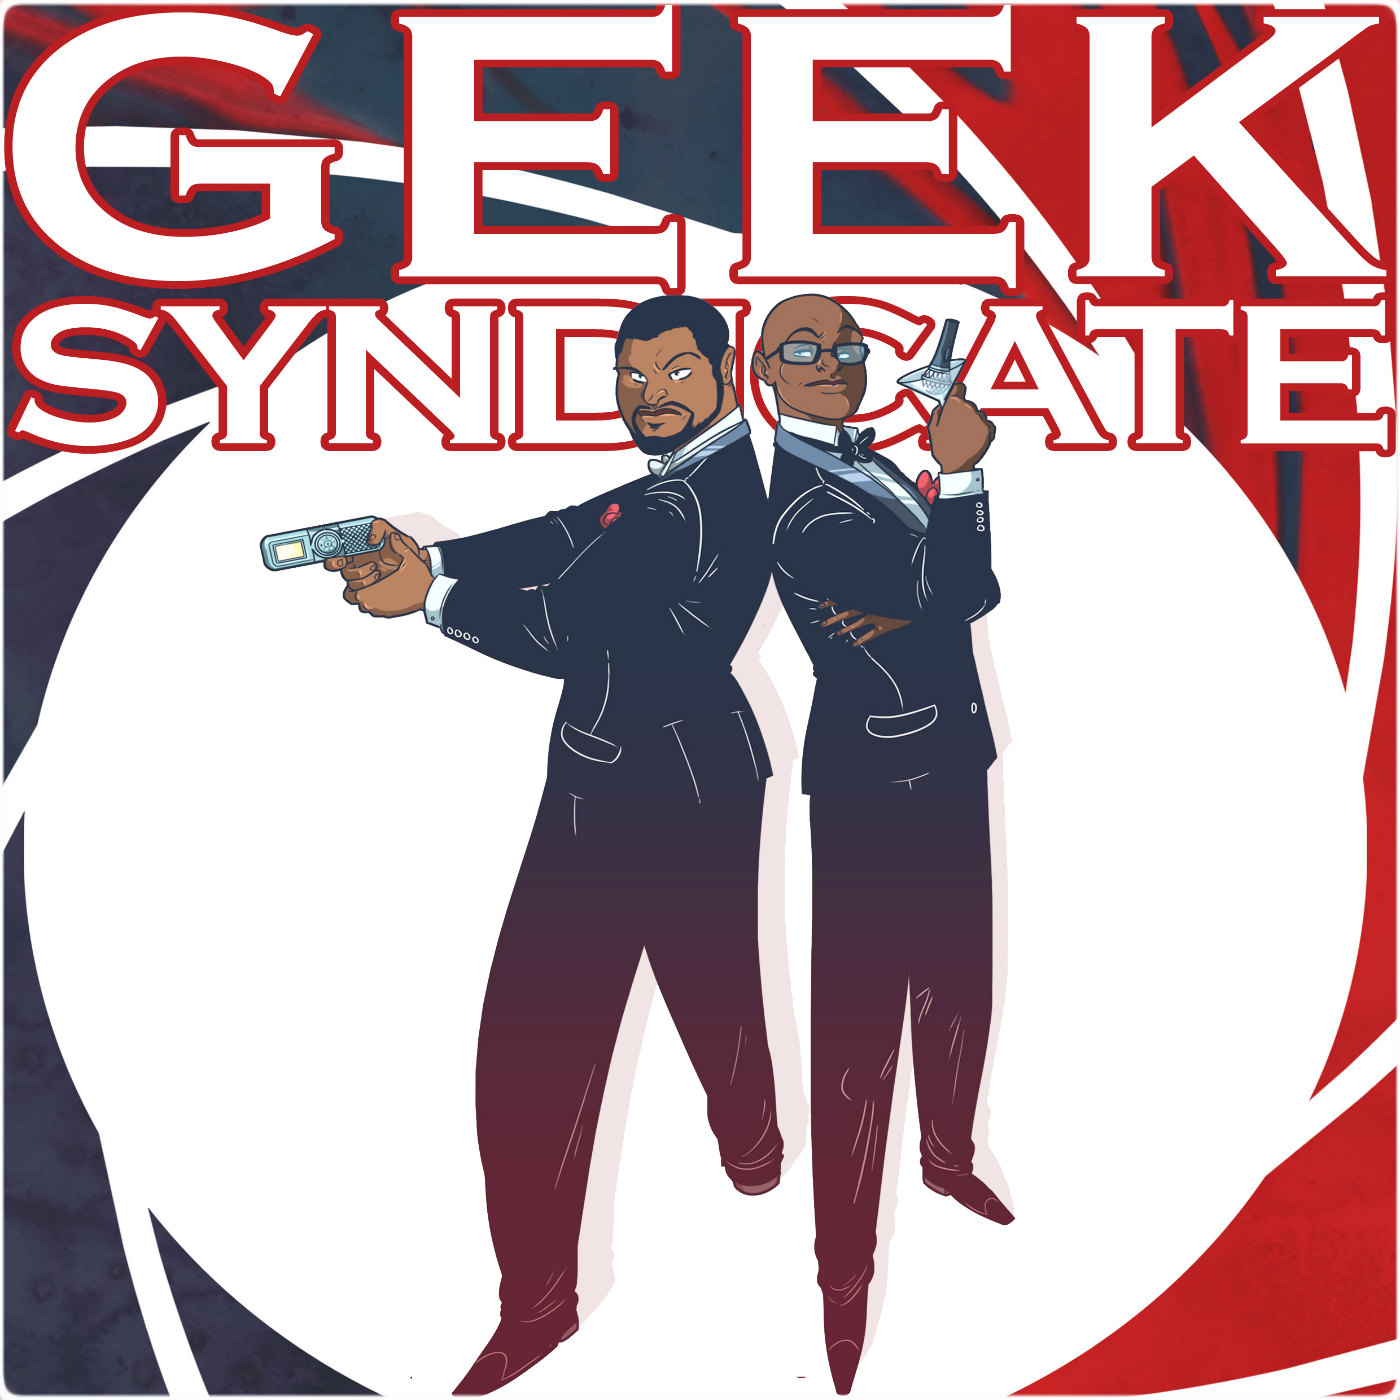 Geek Syndicate show art